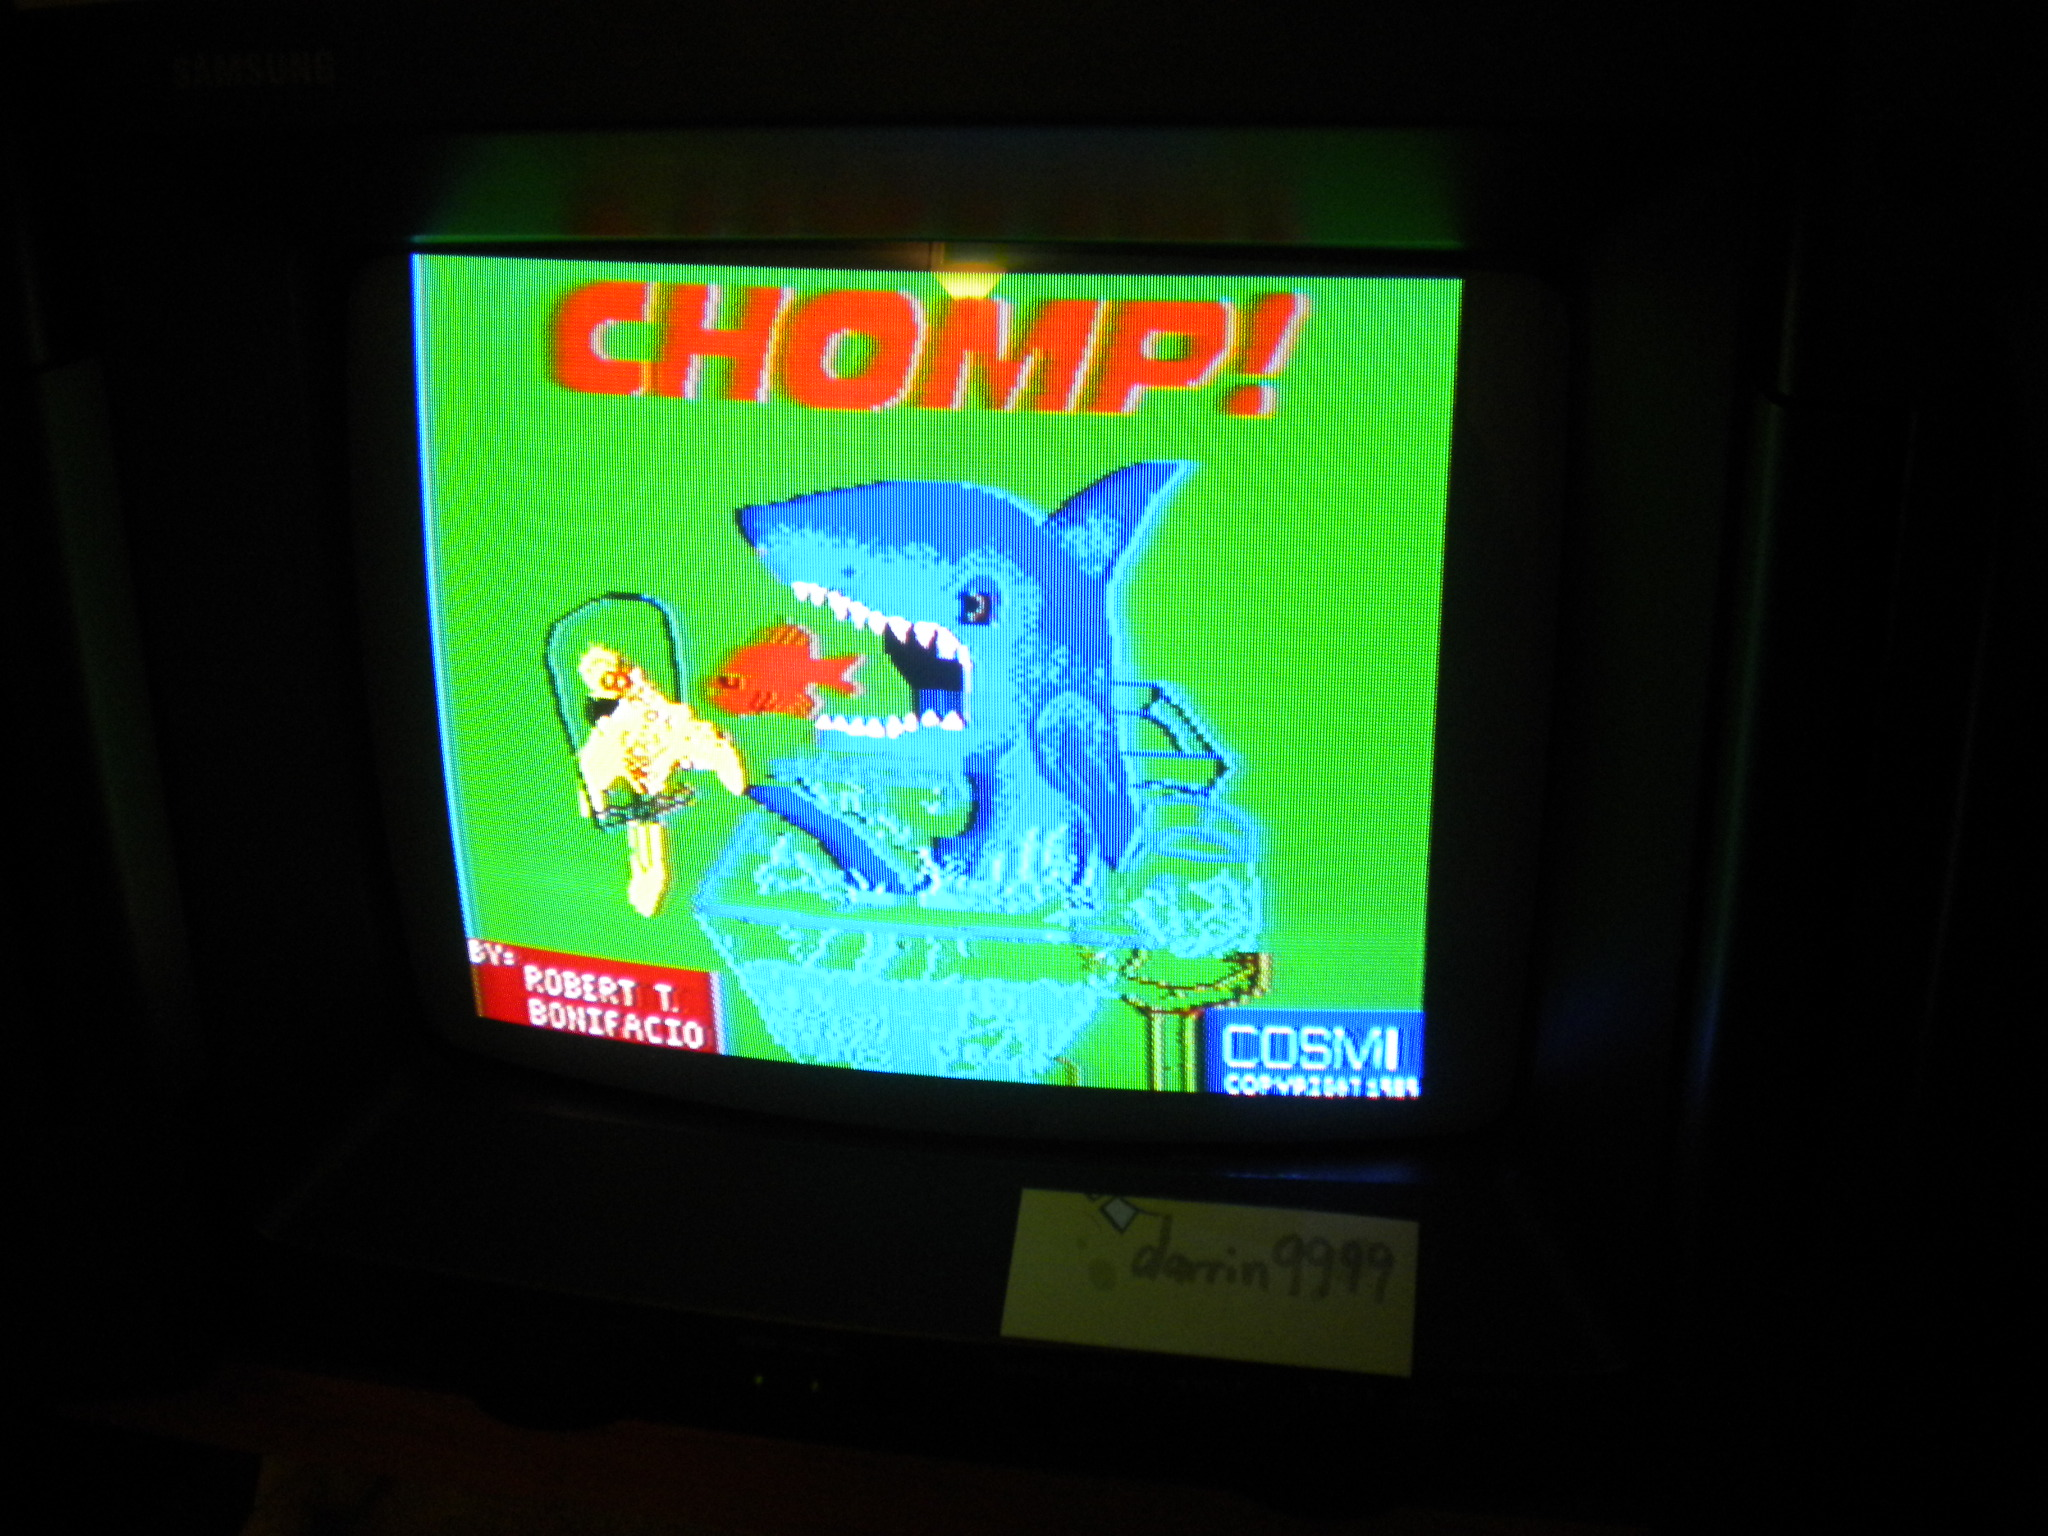 Chomp! [Cosmi 1989] 1,100 points